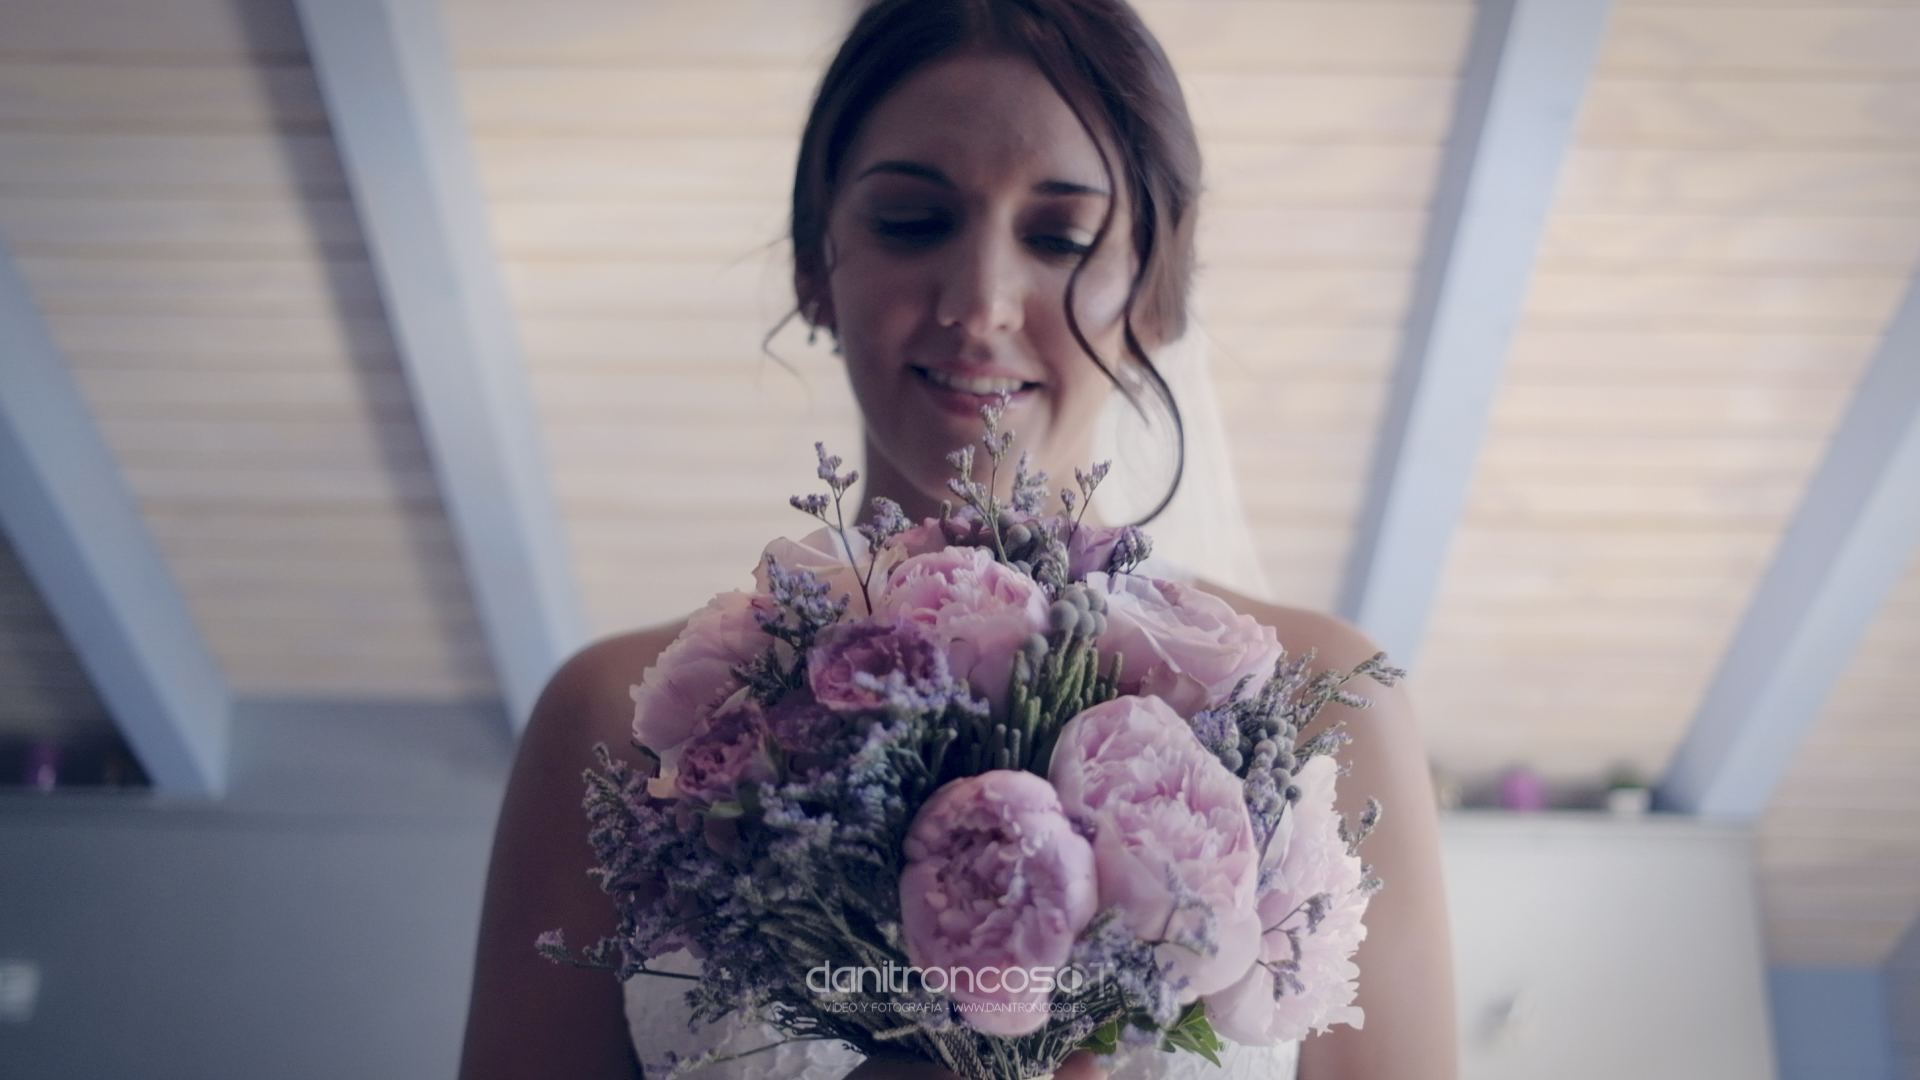 boda-en-tarifa-ermita-pena-valdevaqueros-3